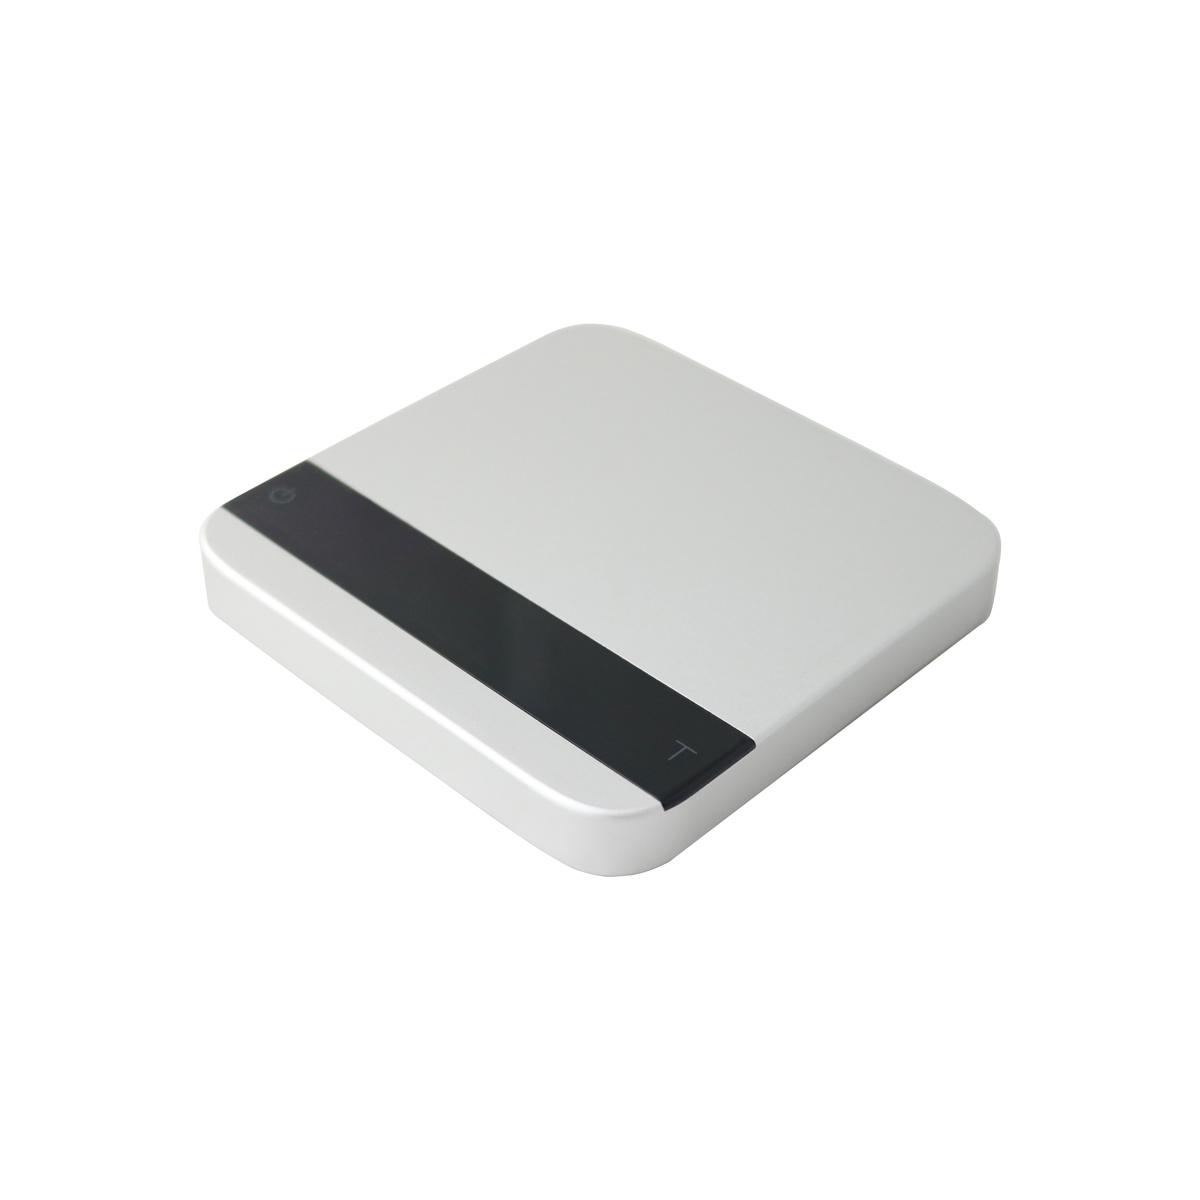 Acaia Lunar Digital Espresso Scale Silver  - AL006